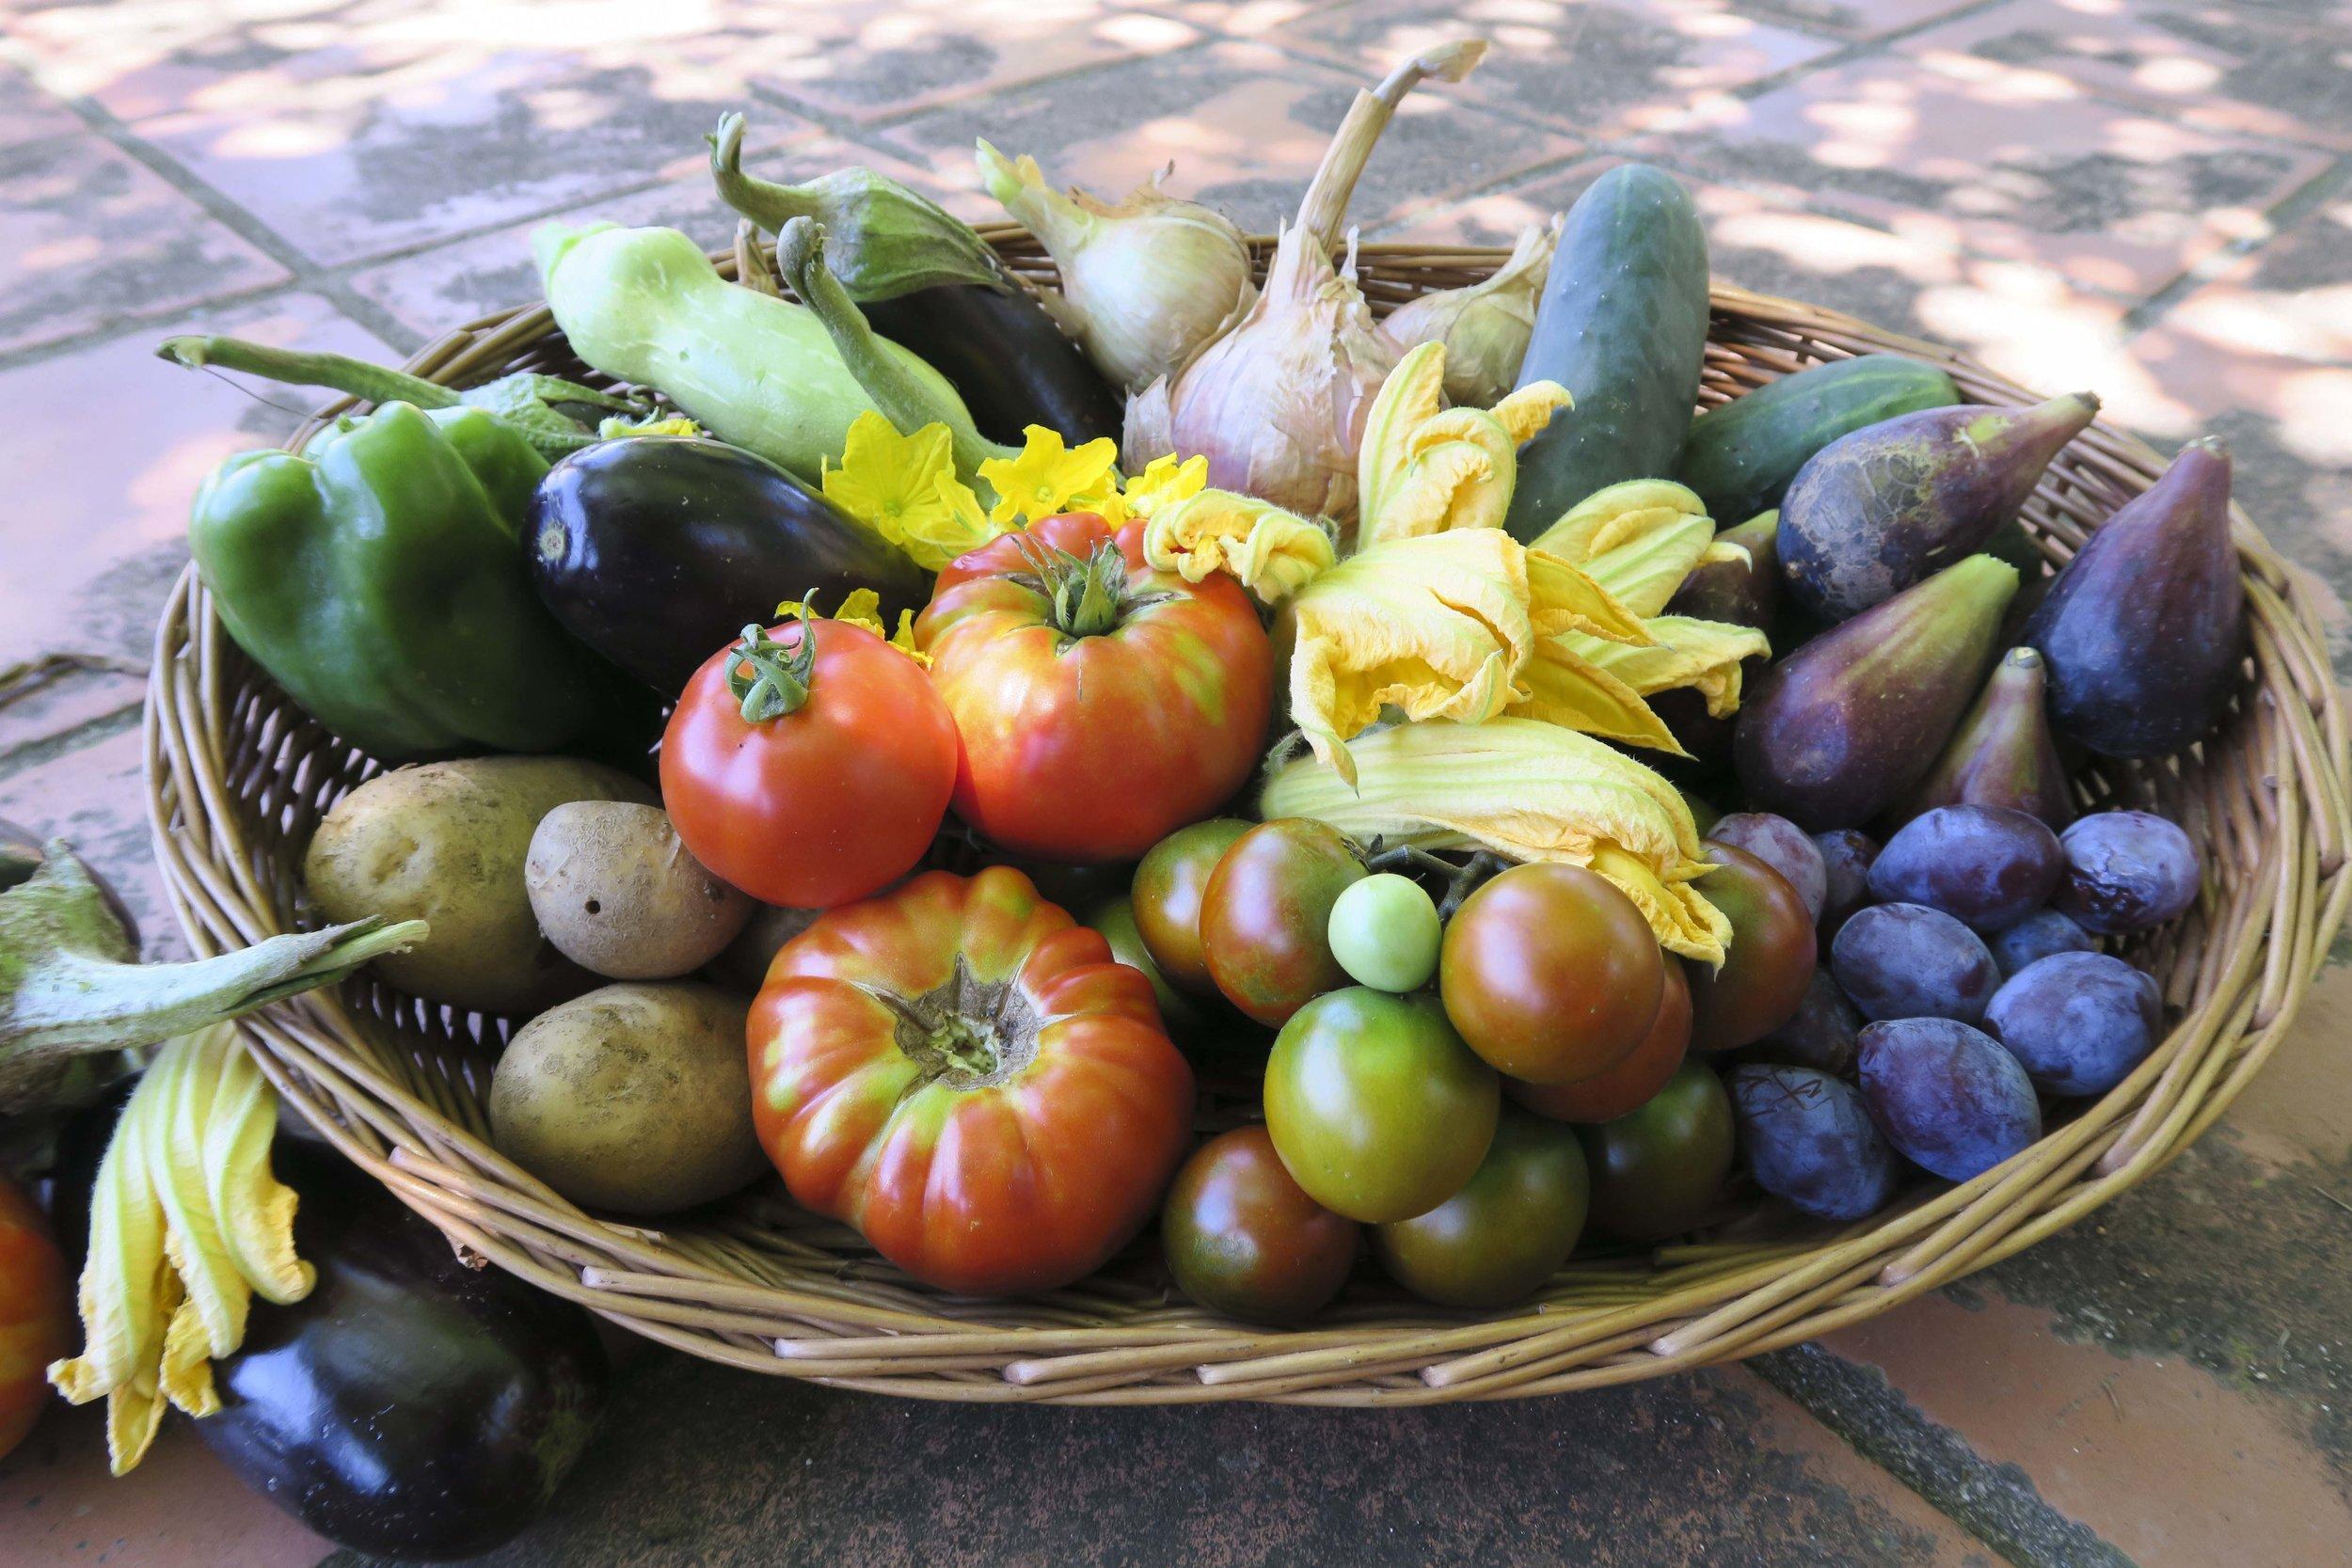 Organic garden veggies